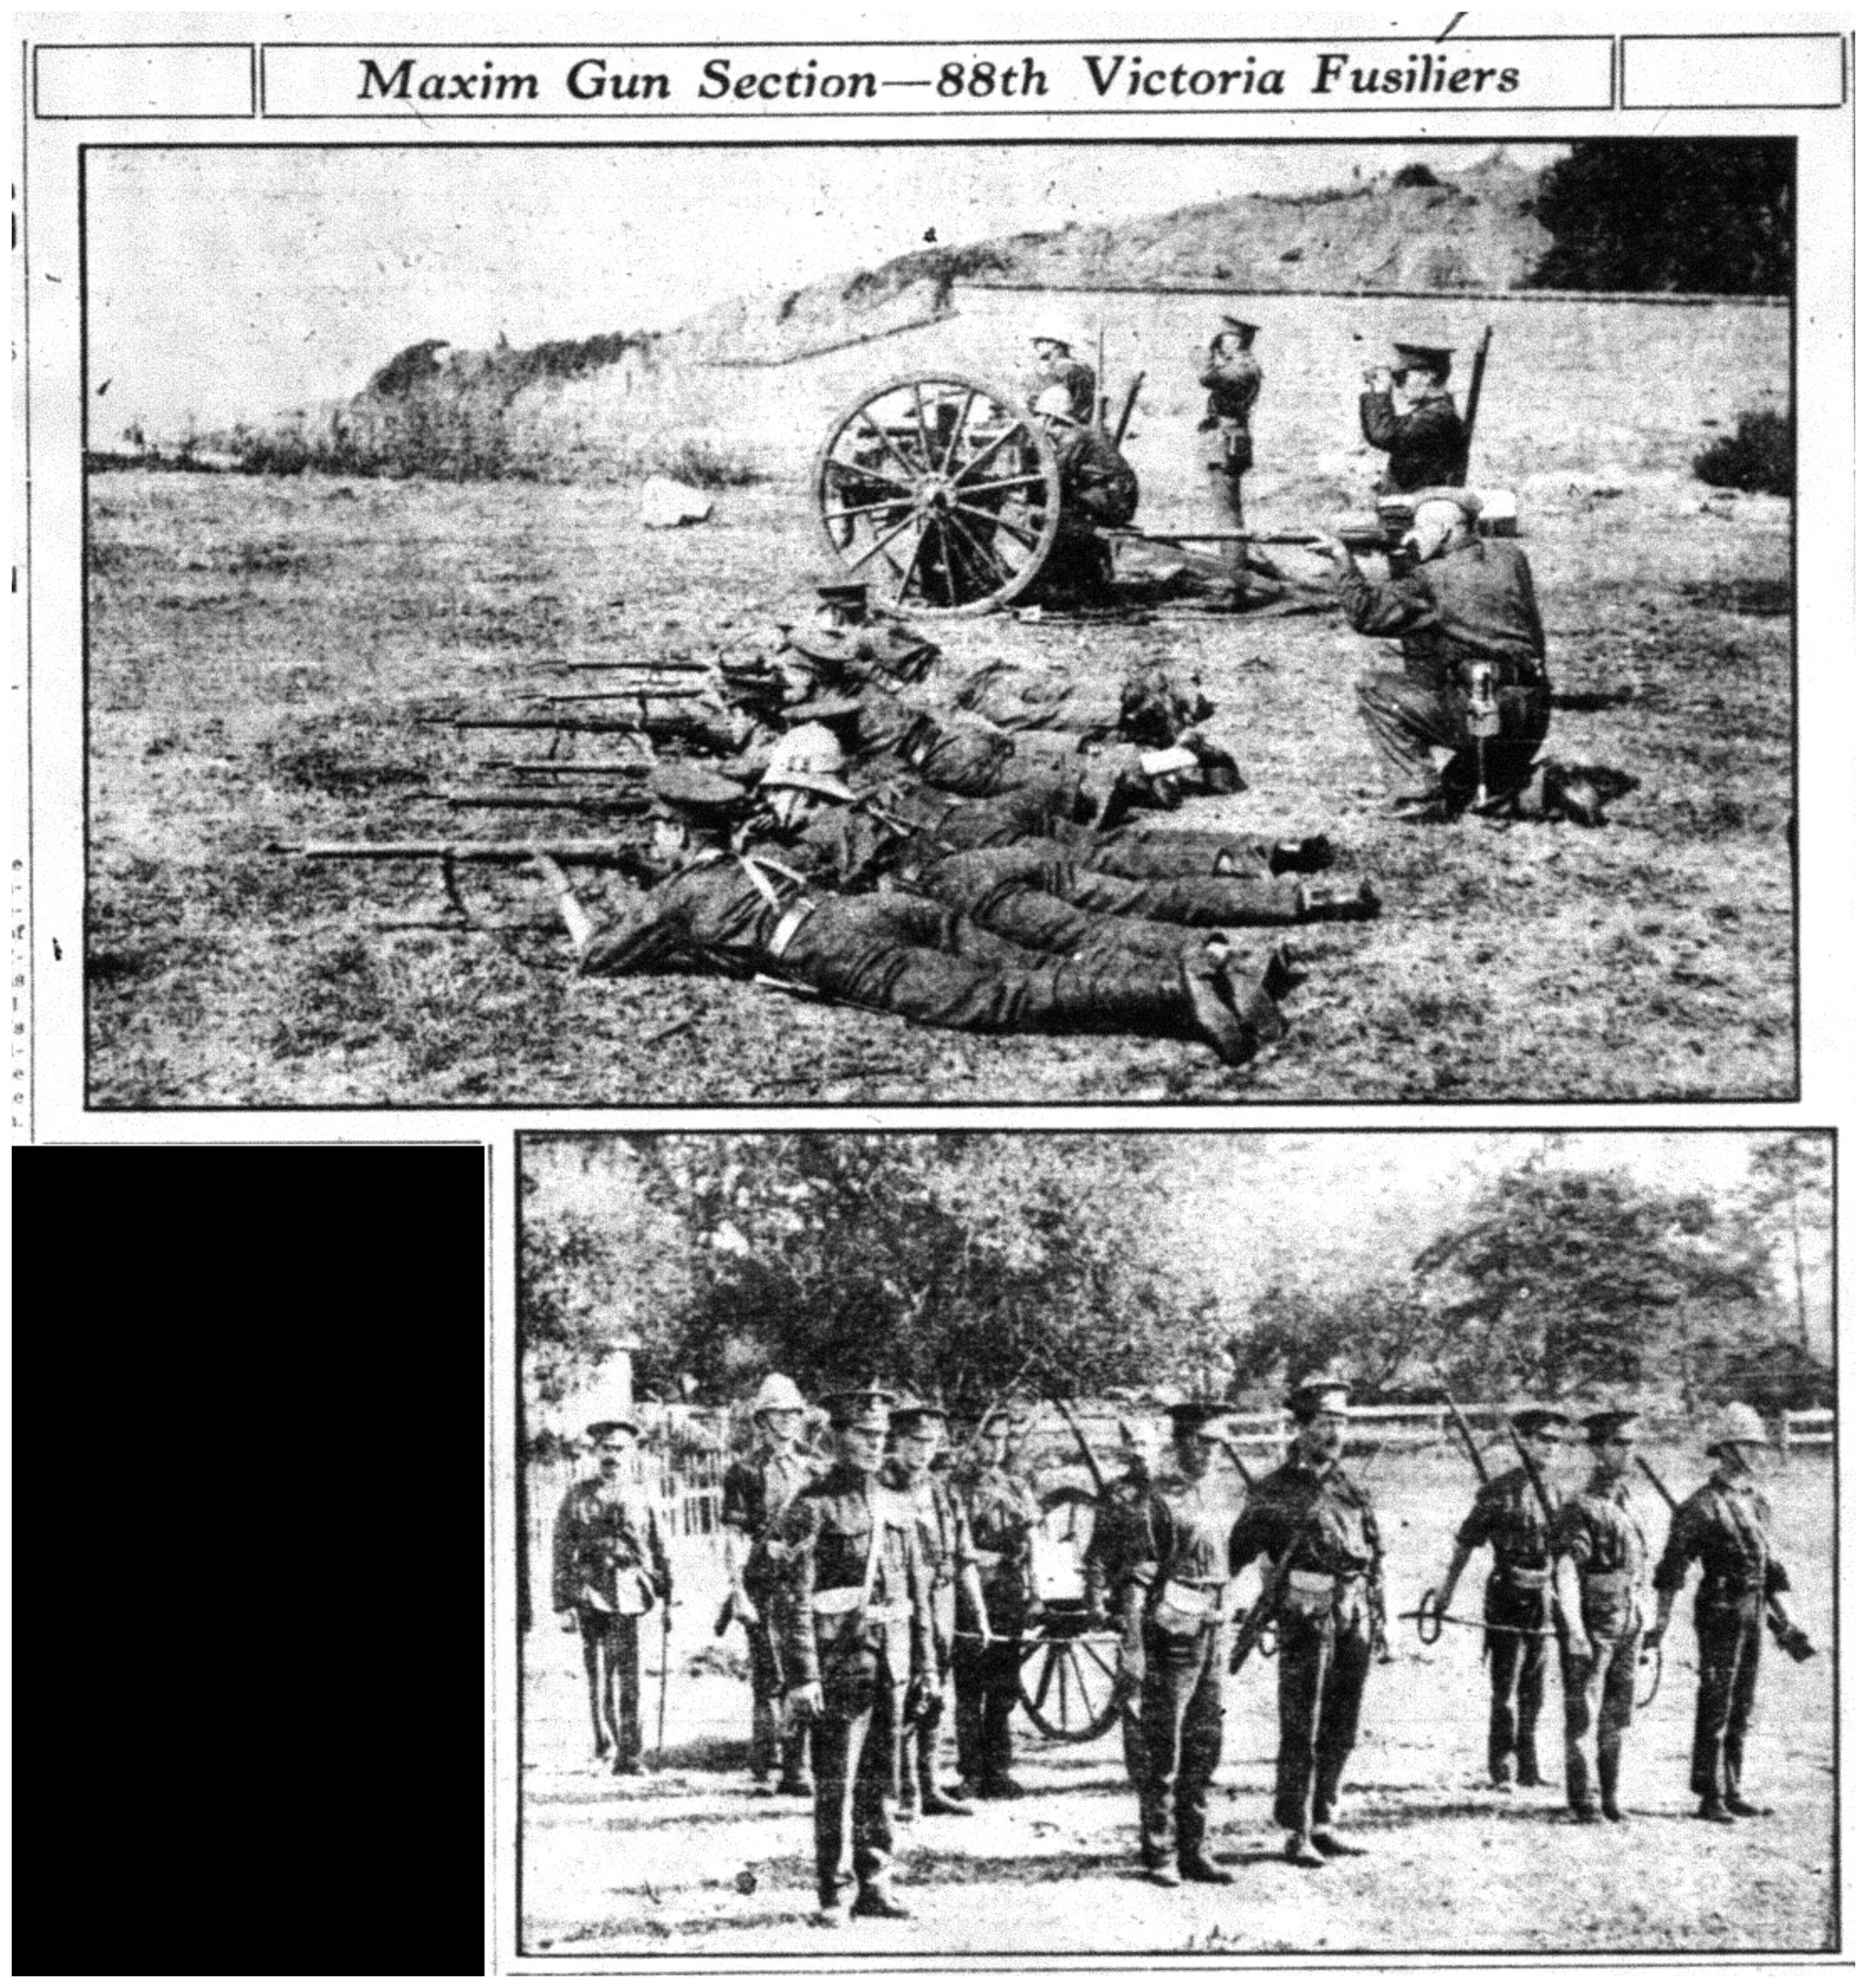 """Maxim Gun Section - 88th Victoria Fusiliers"""